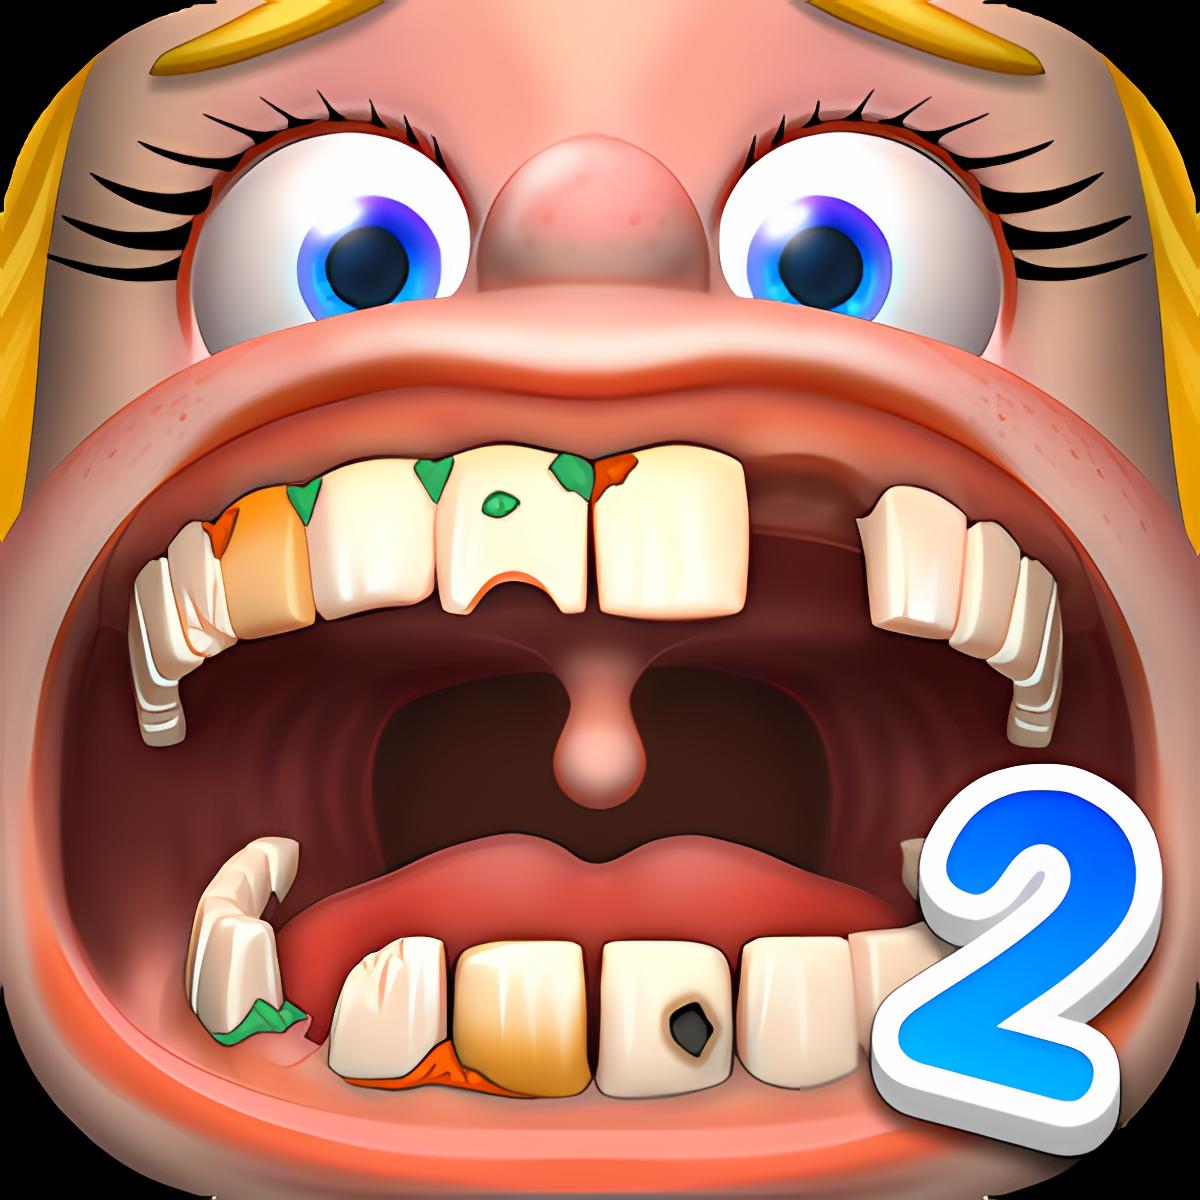 Crazy Dentist 2 Match 3 Game 1.0.0